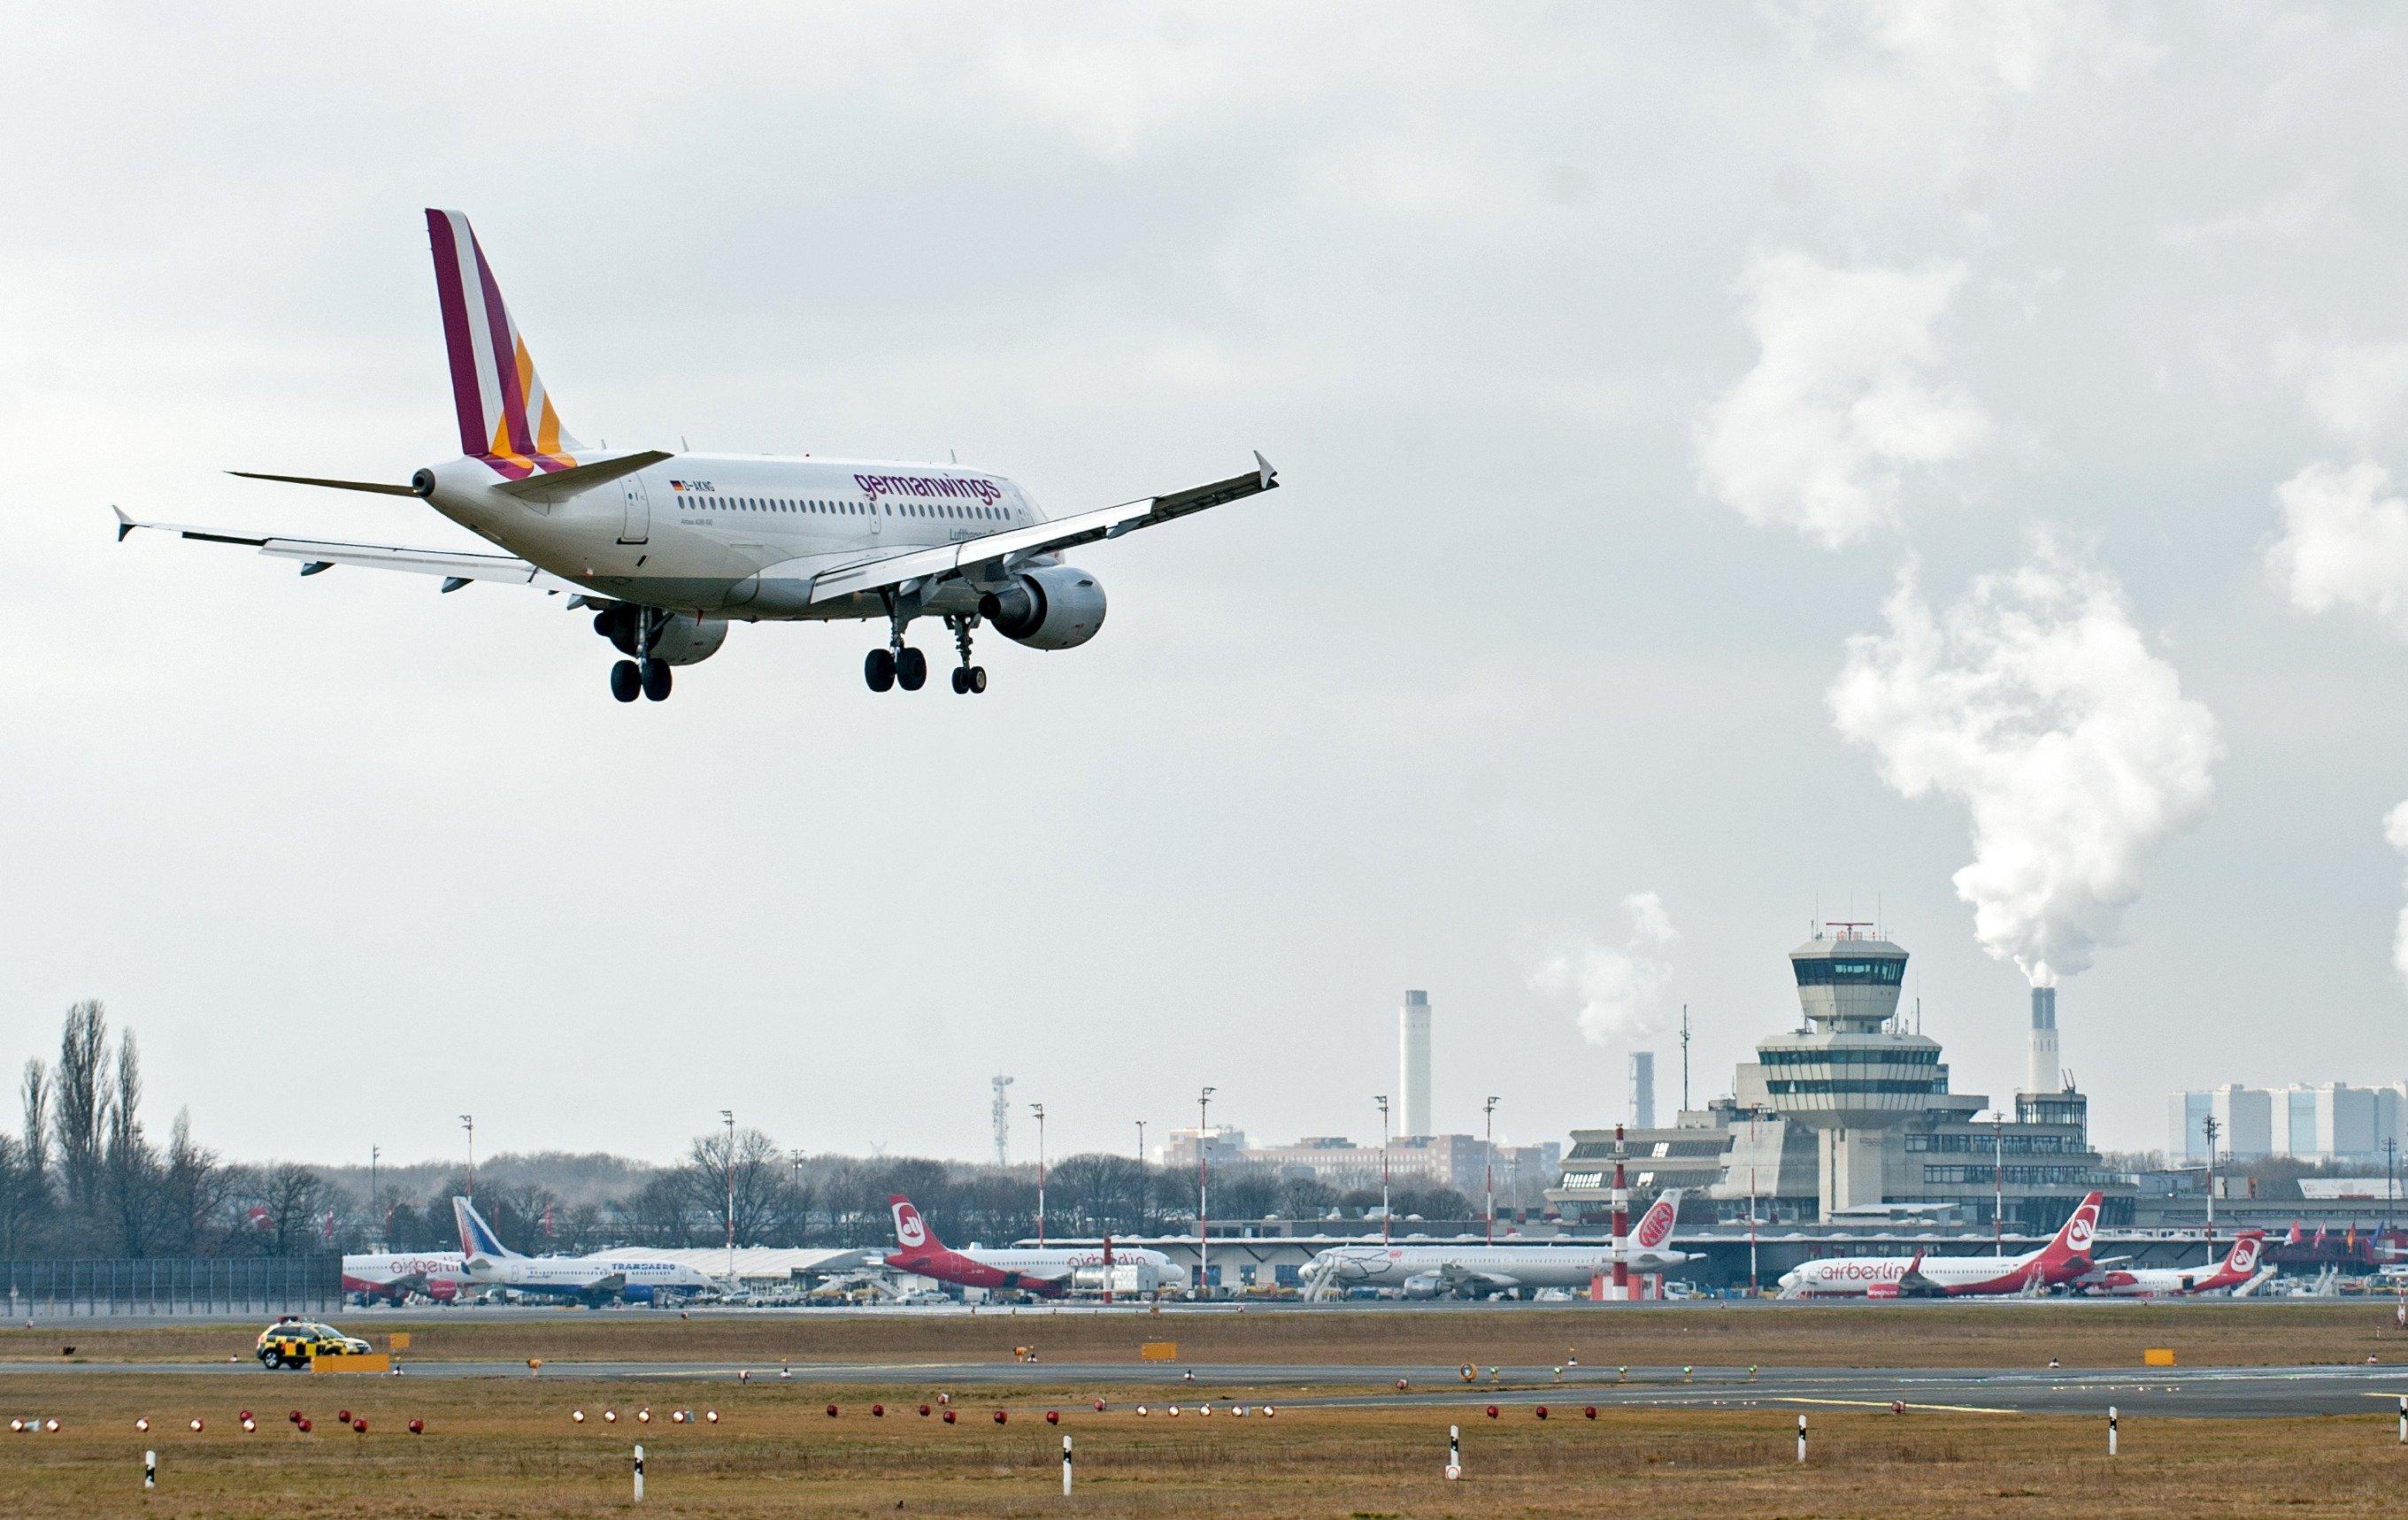 Самолет Airbus A320 авиакомпании German Wings